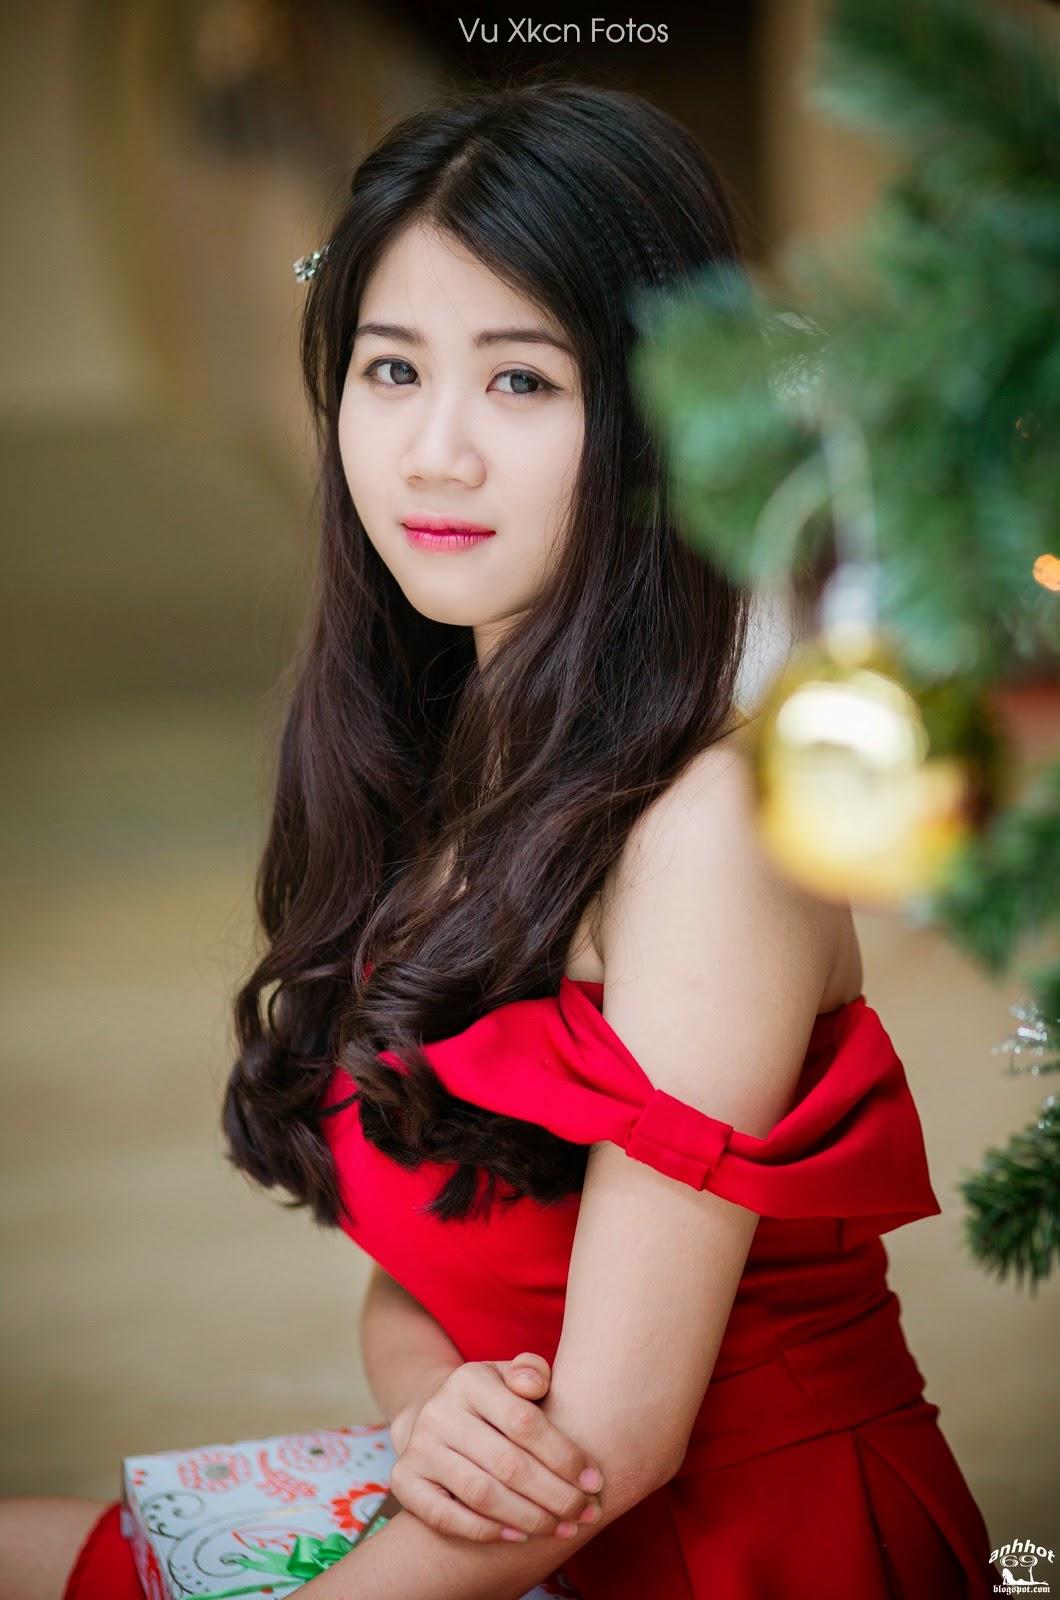 merry-christmas_1412251540_06